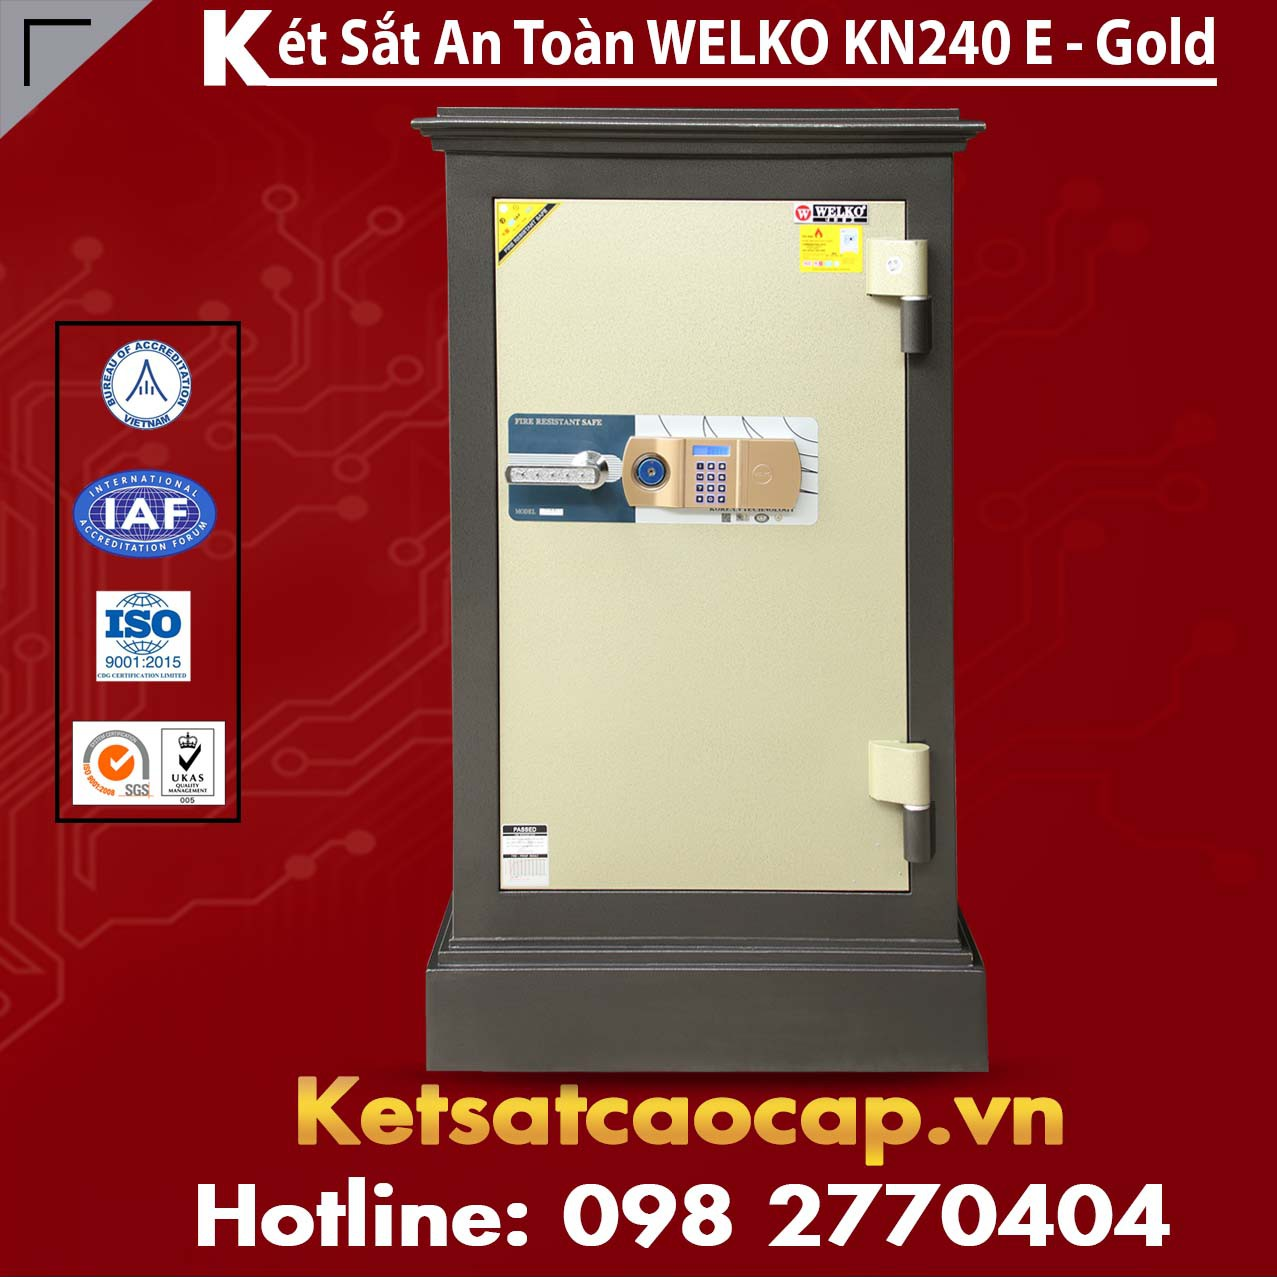 Két Sắt Đặt Theo Yêu Cầu WELKO KN240 Black E Gold